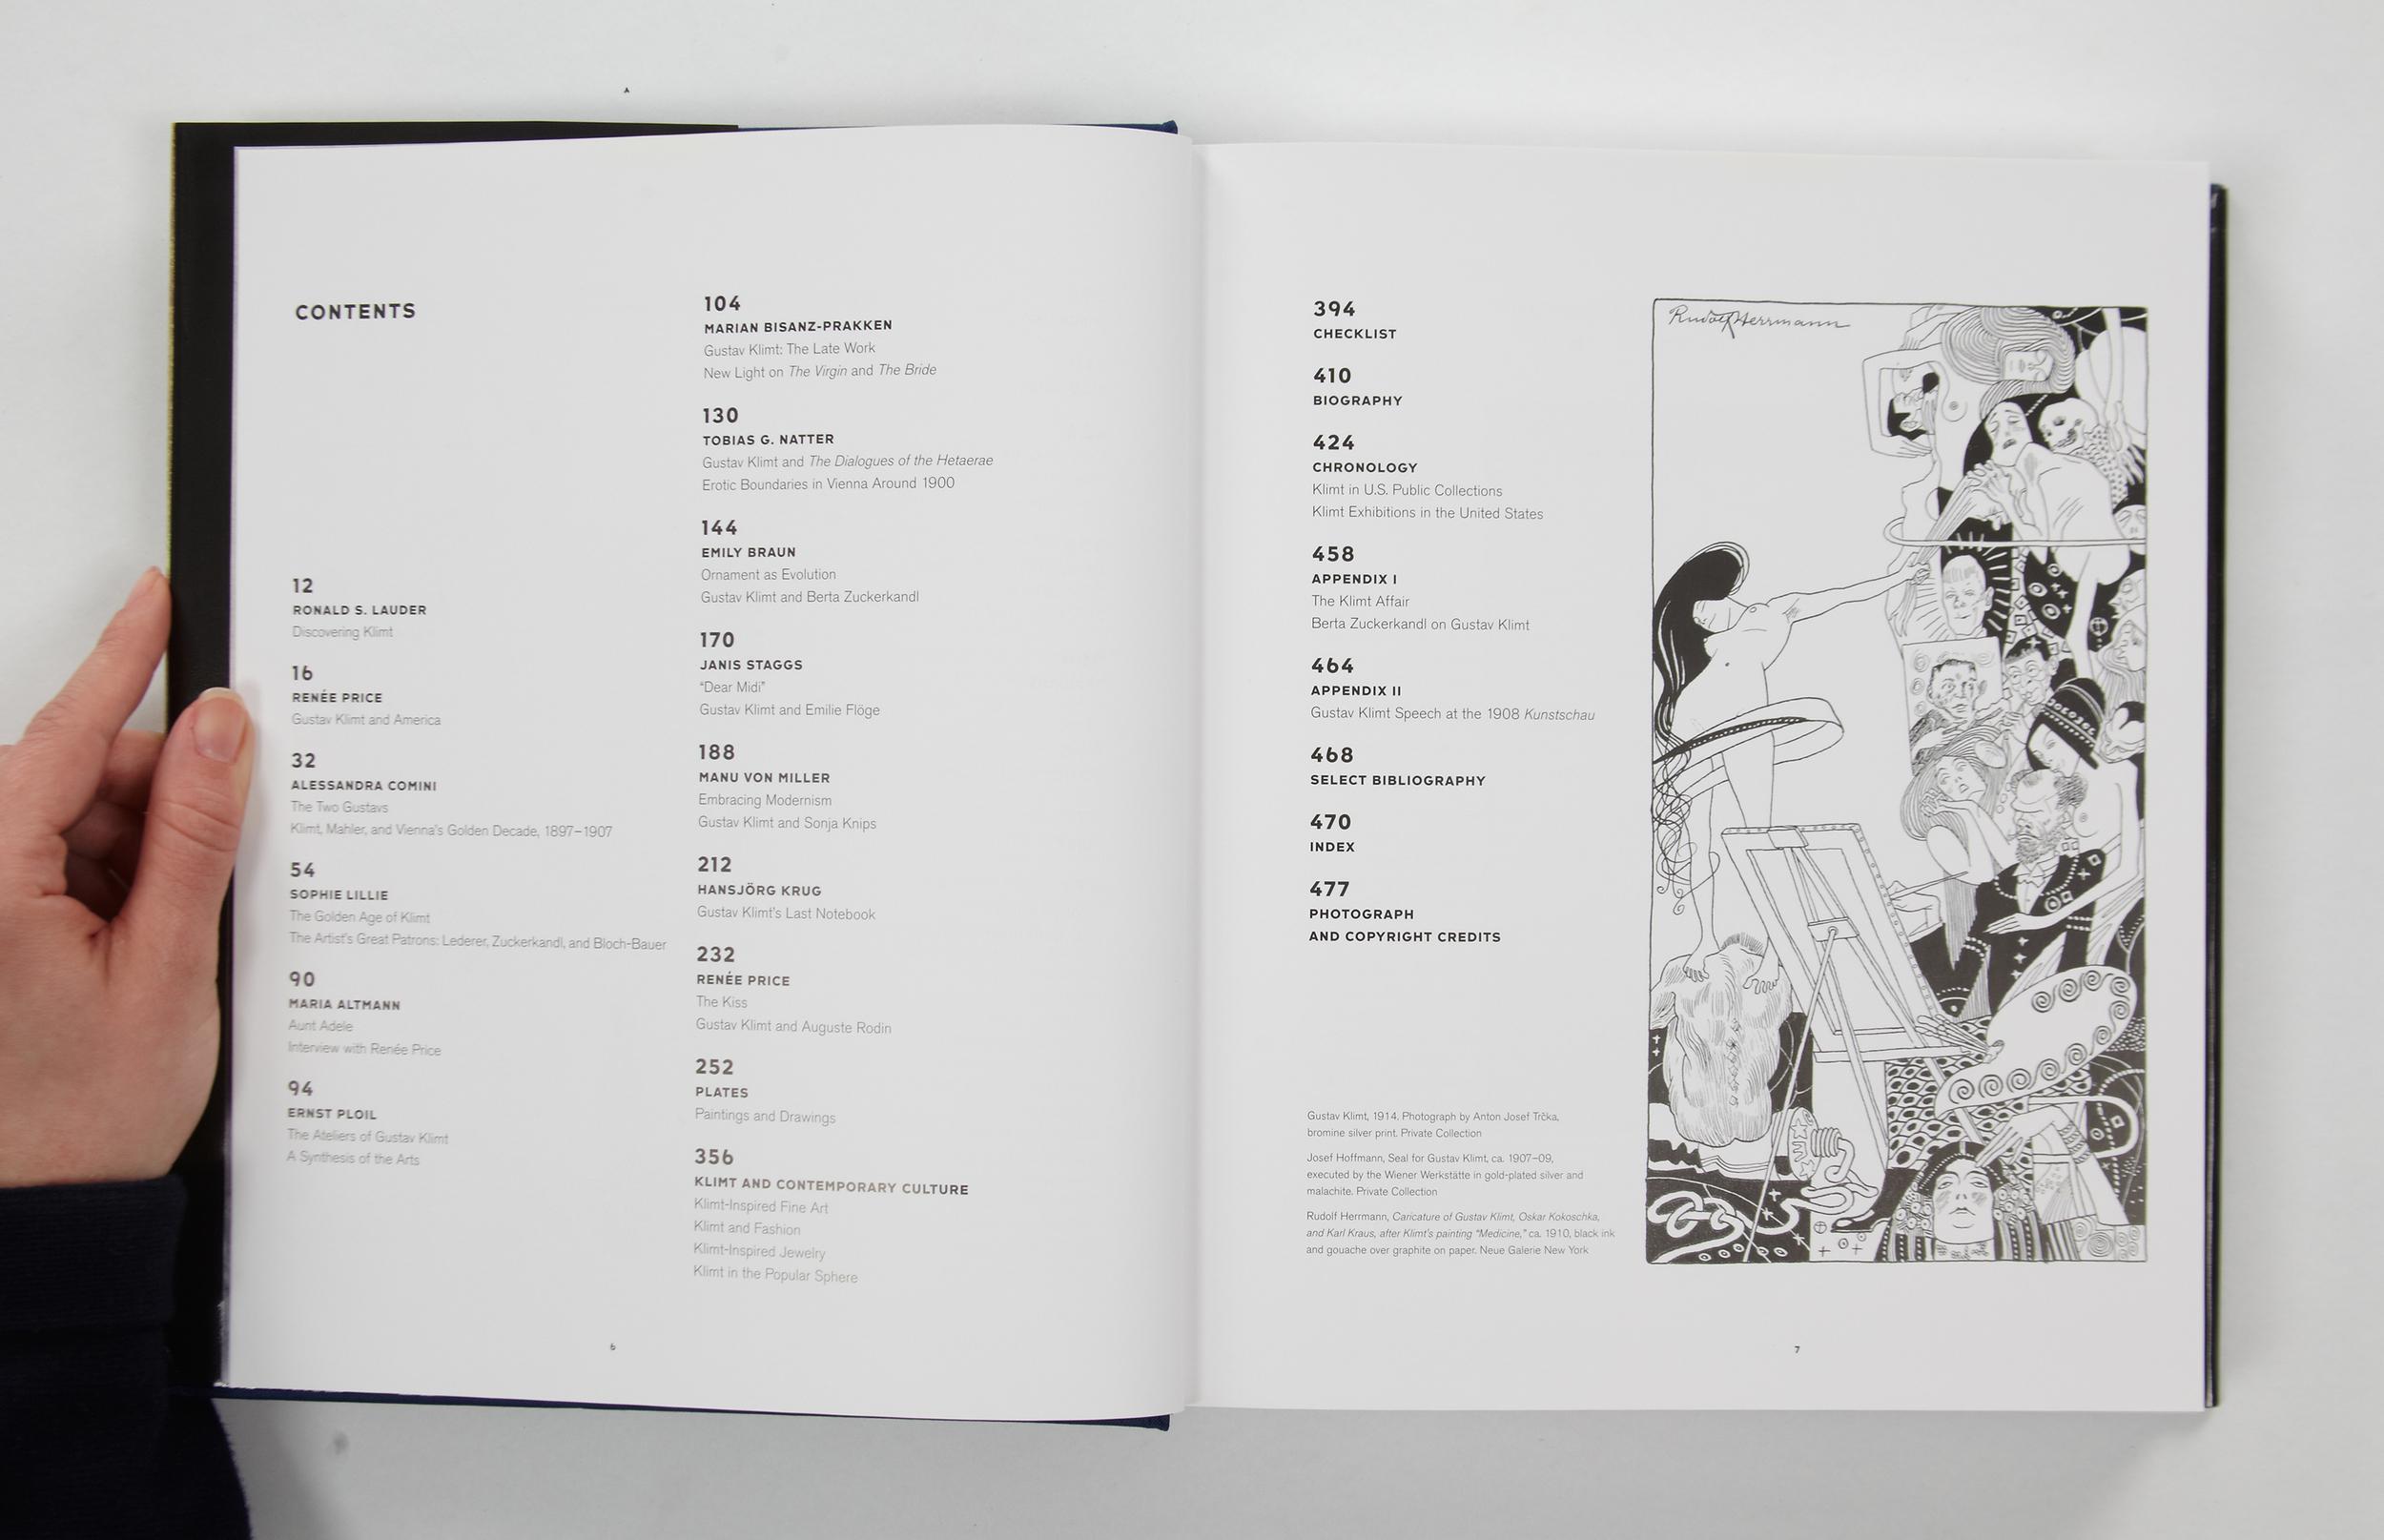 MG_Klimt_bookpost__0001_TSE_Invitations__549.jpg.jpg